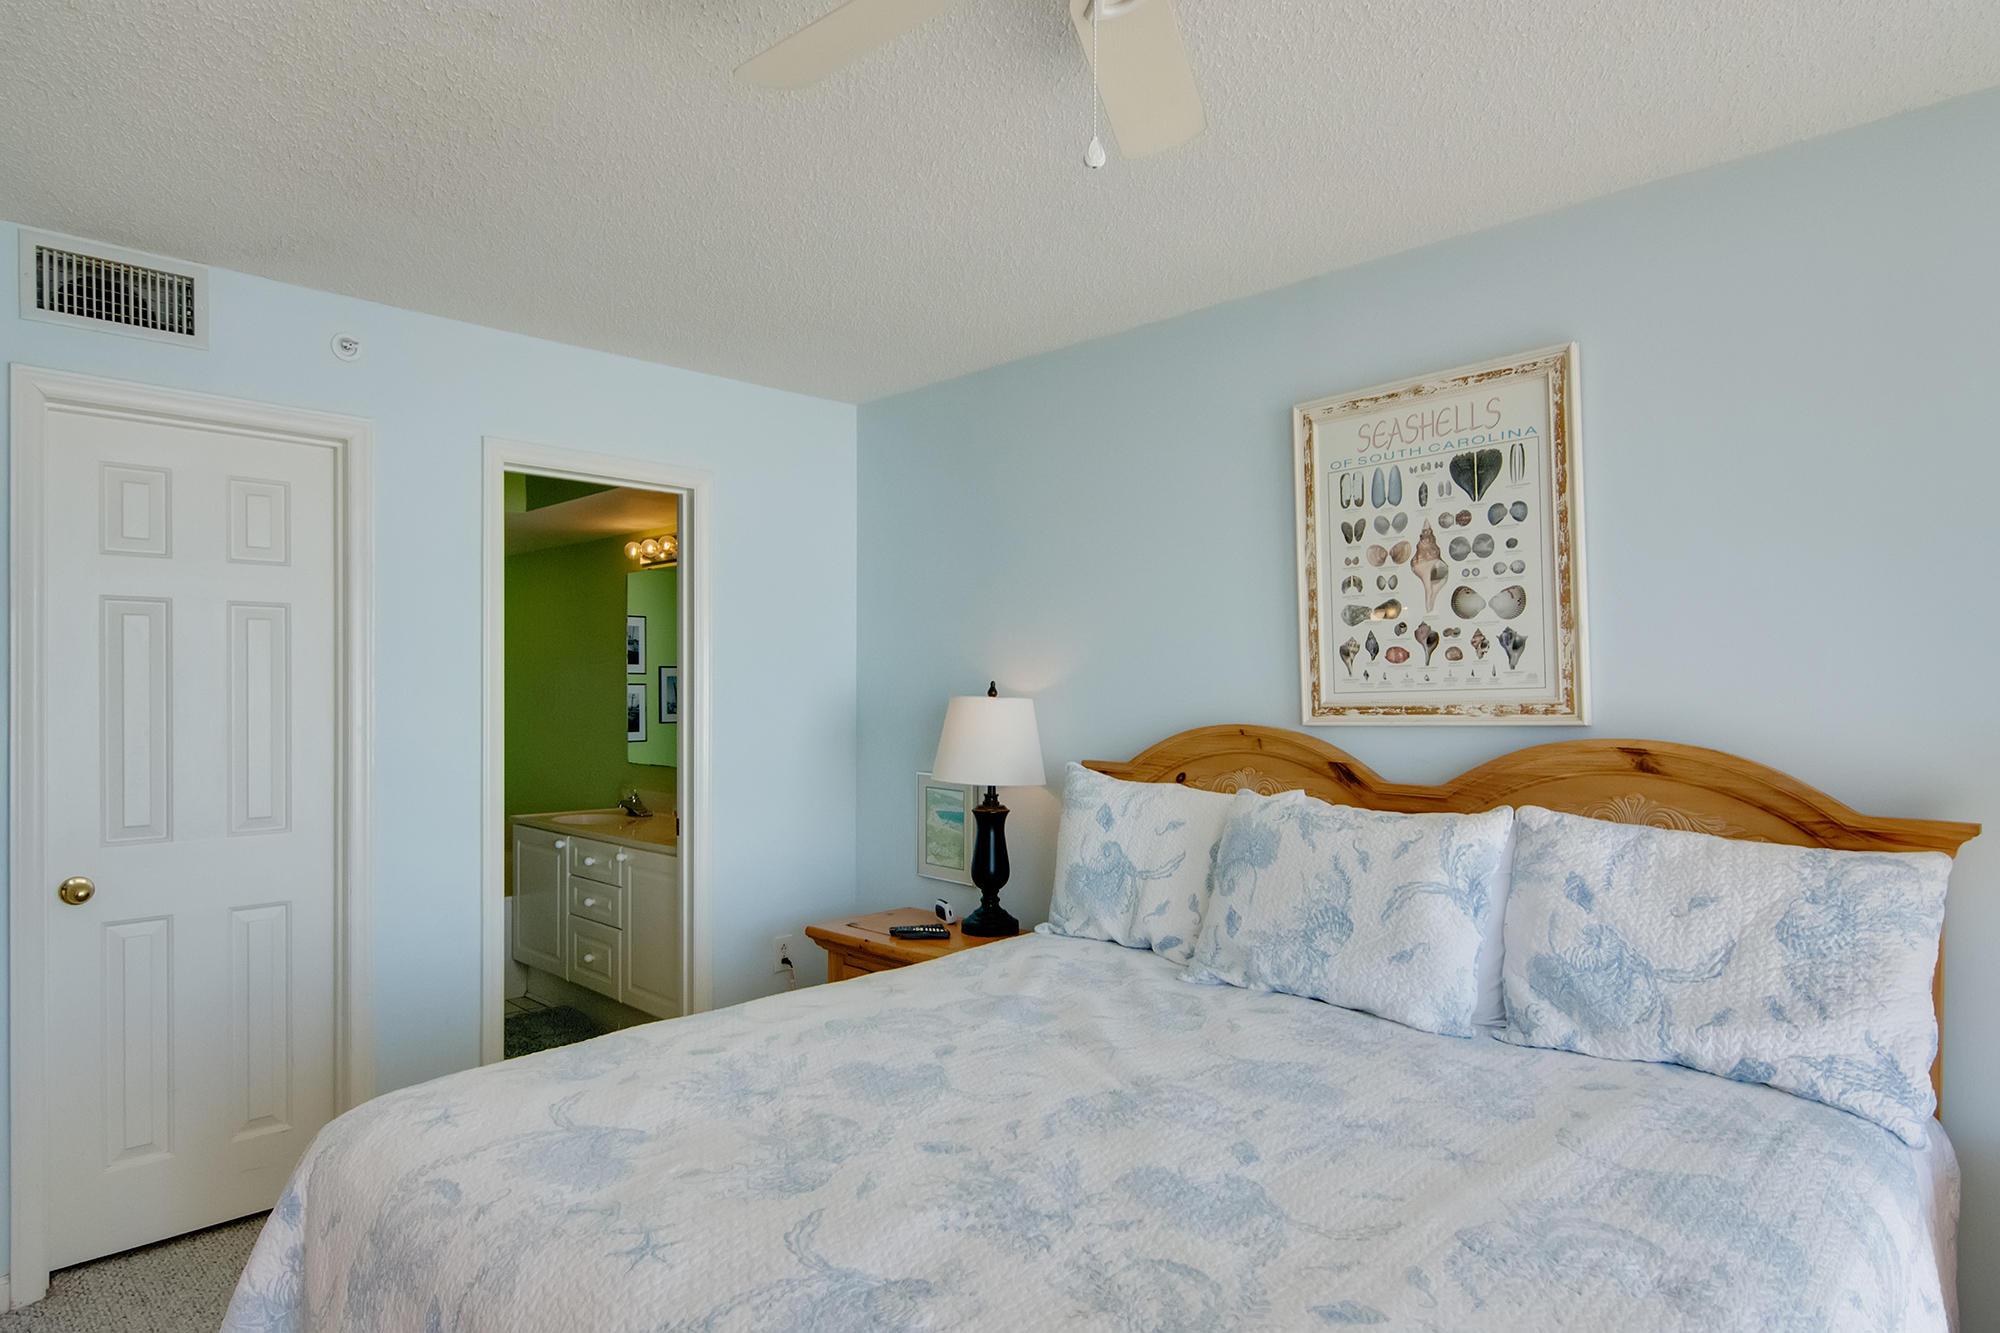 Charleston Oceanfront Villas Homes For Sale - 201 Arctic, Folly Beach, SC - 14